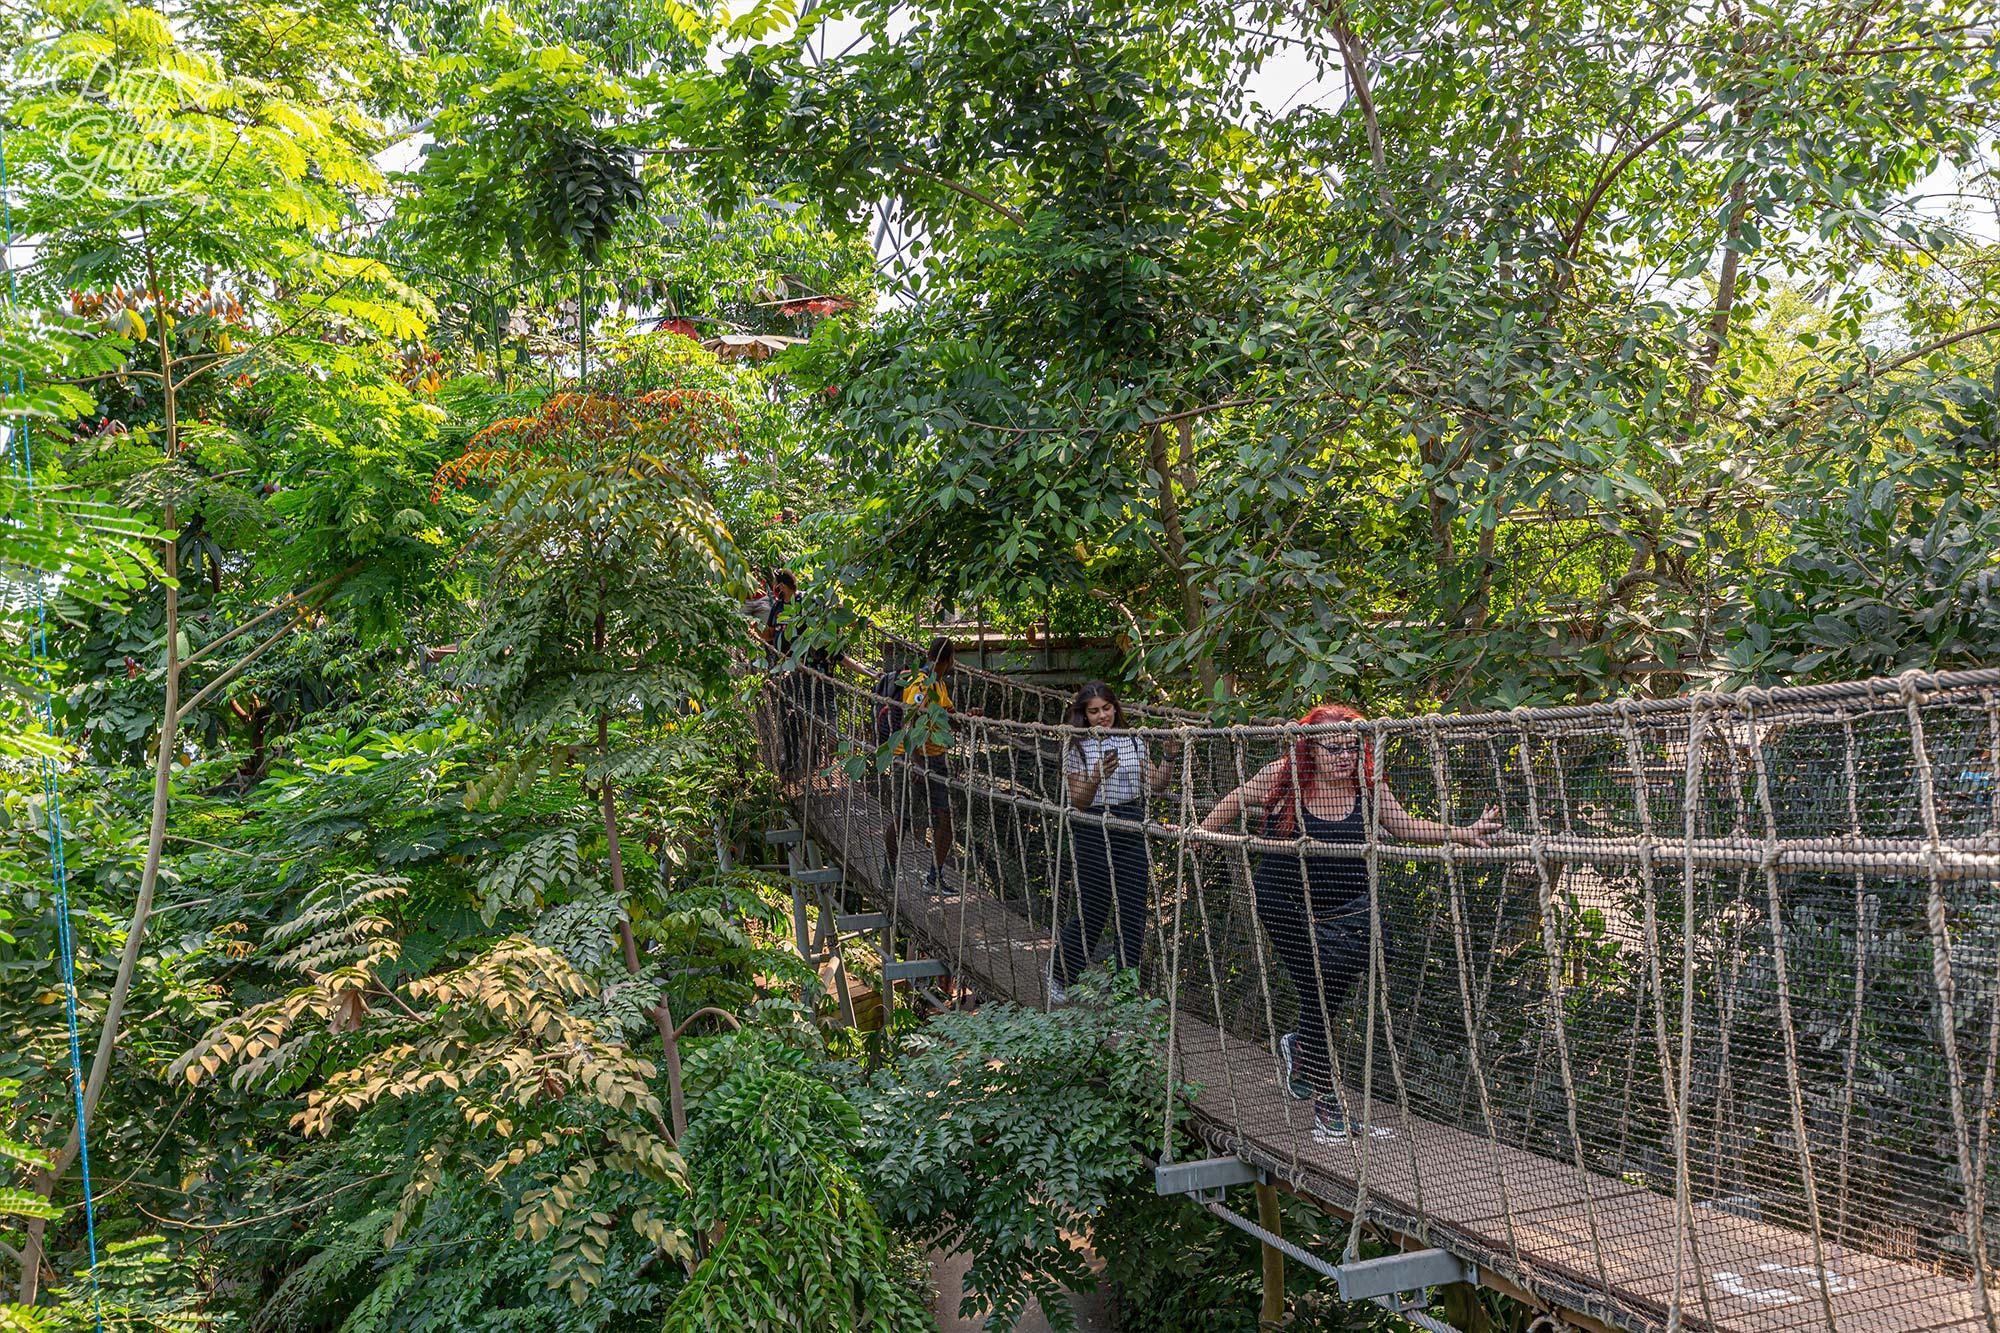 The Wobbly Bridge inside the Rainforest Biome